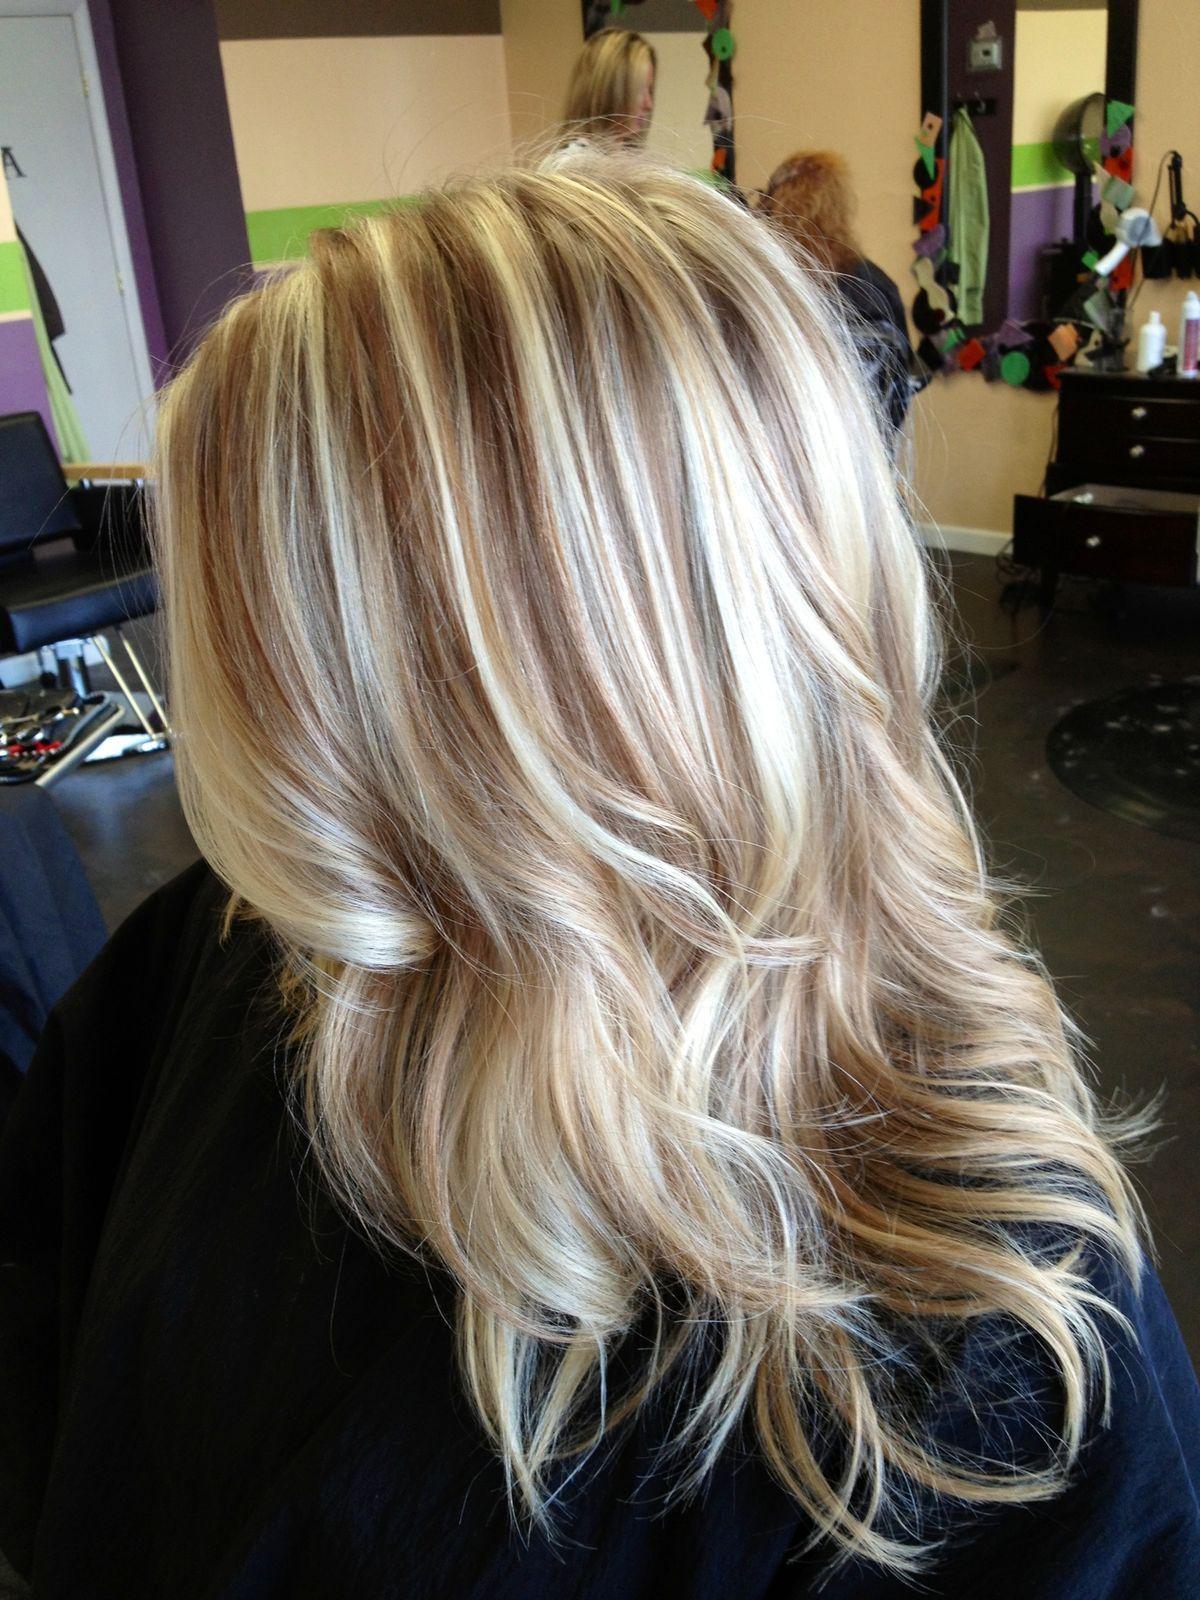 d9332c40e681be53fd5d1cf 1200—1600 Hair